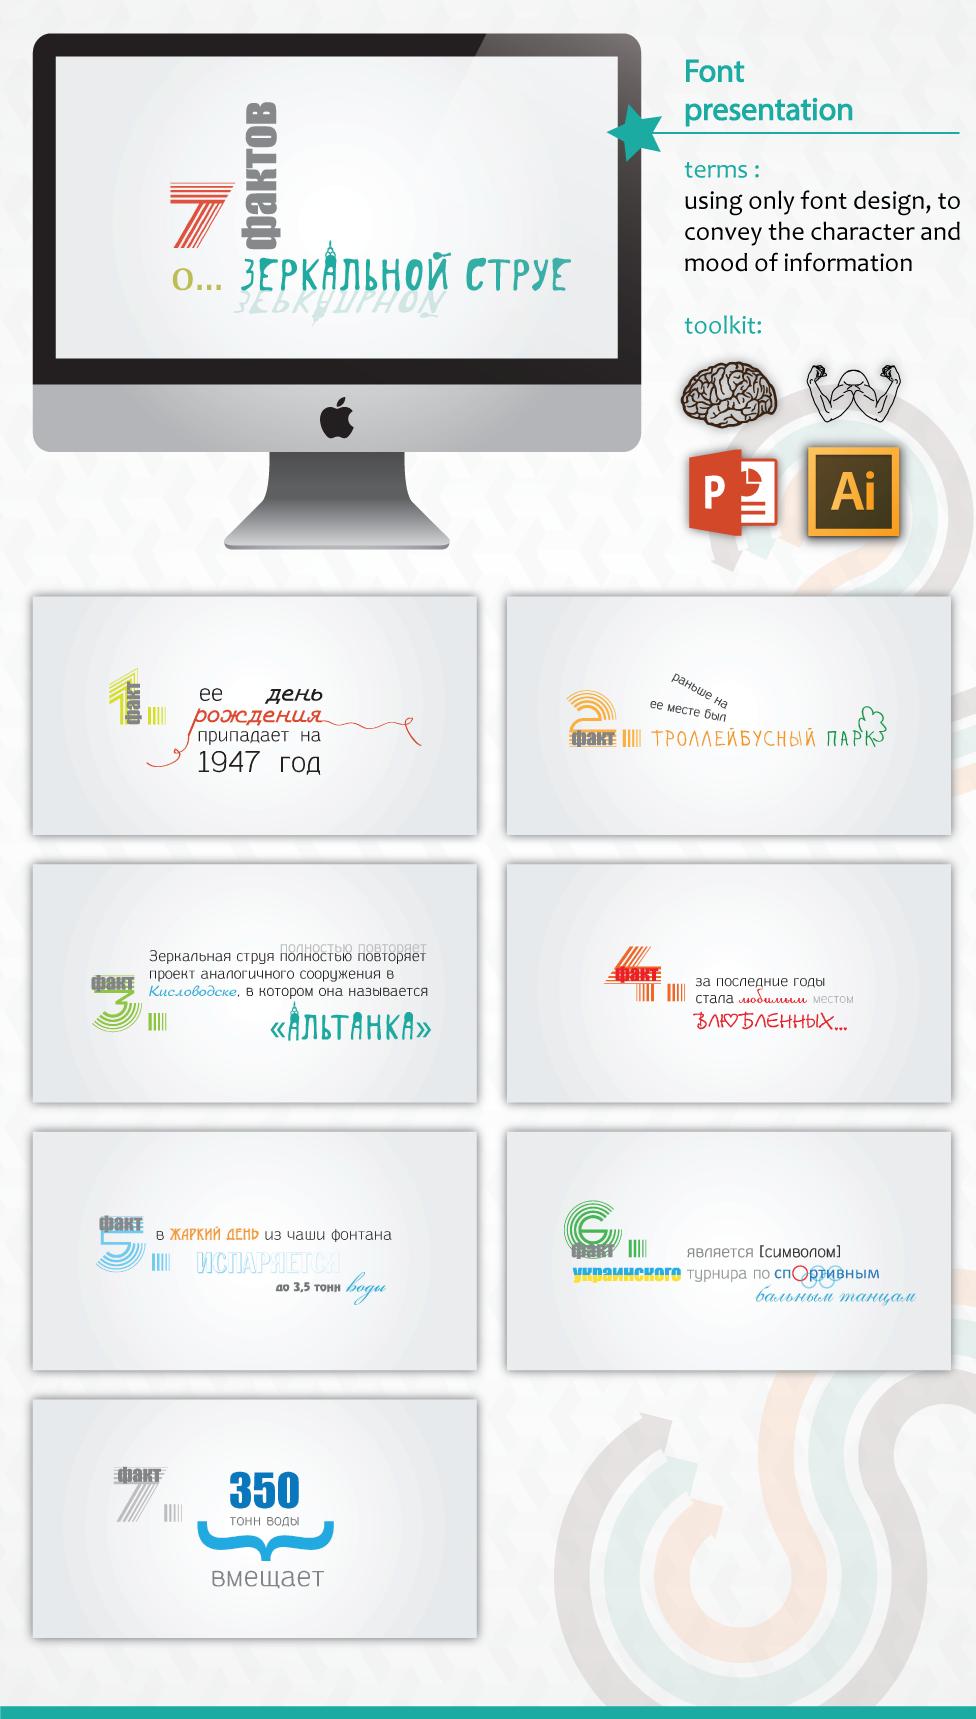 Font presentation